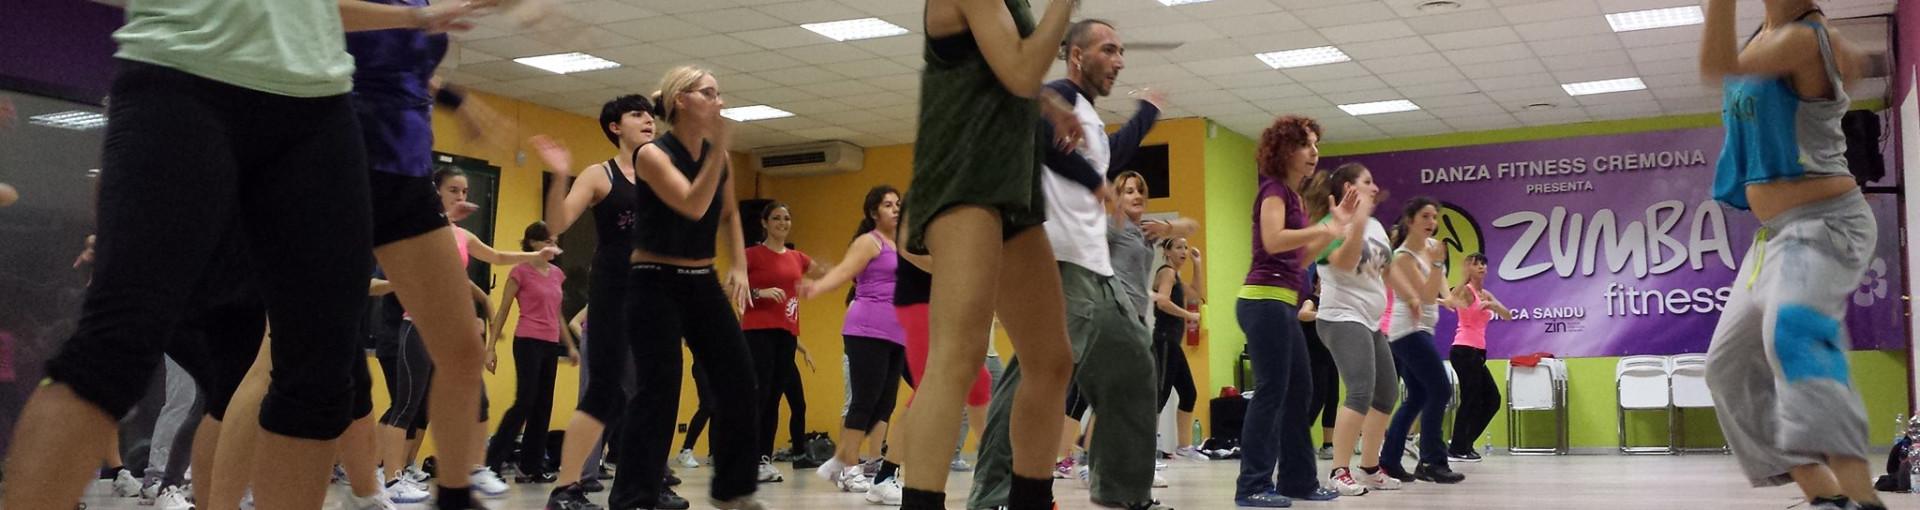 Danza Fitness Studio - Cremona